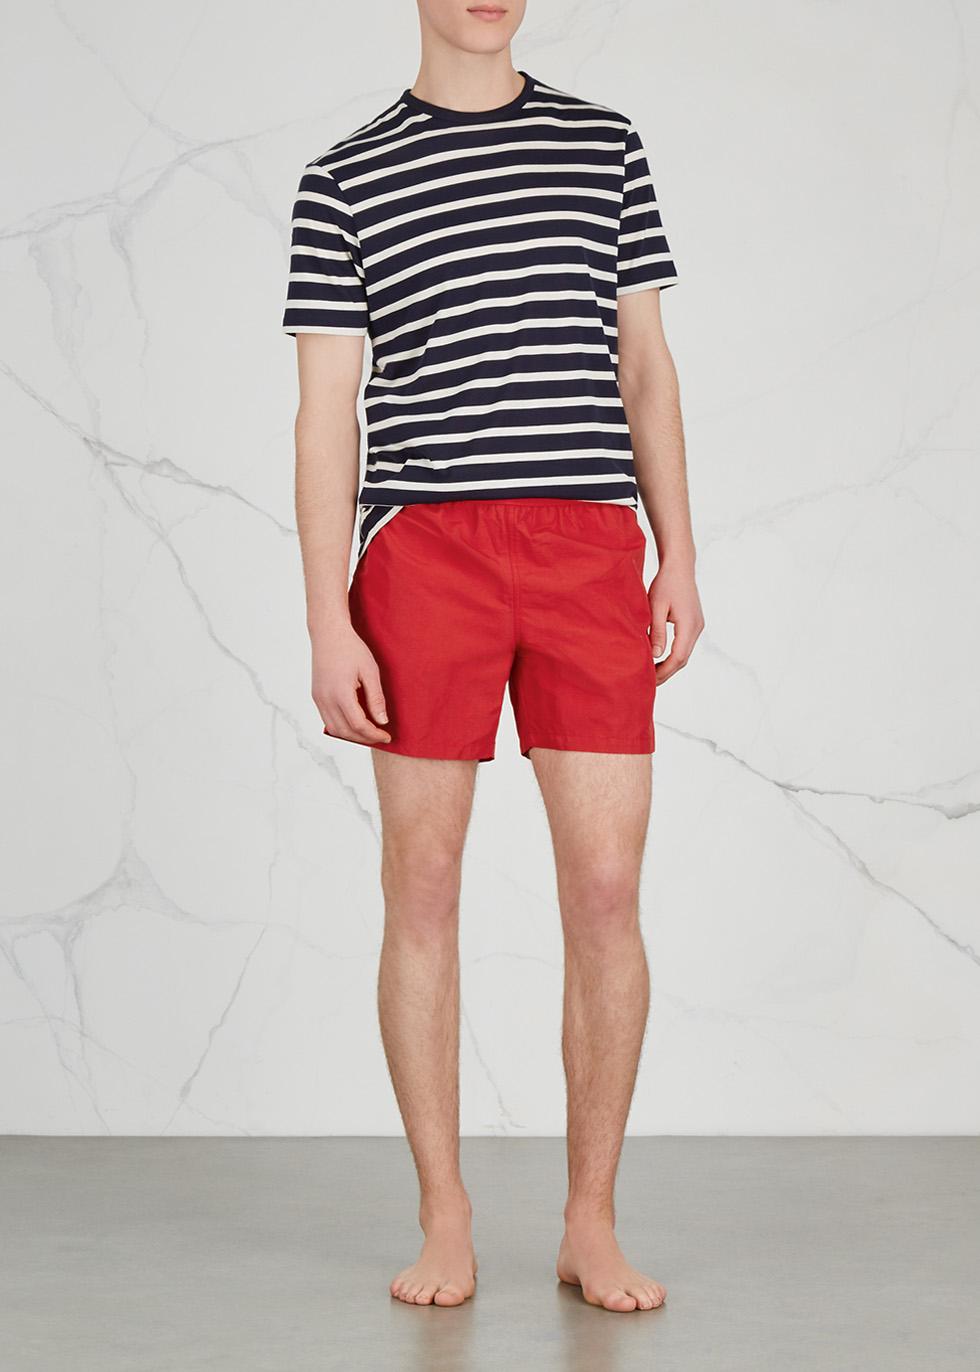 Hawaiian red swim shorts - Polo Ralph Lauren